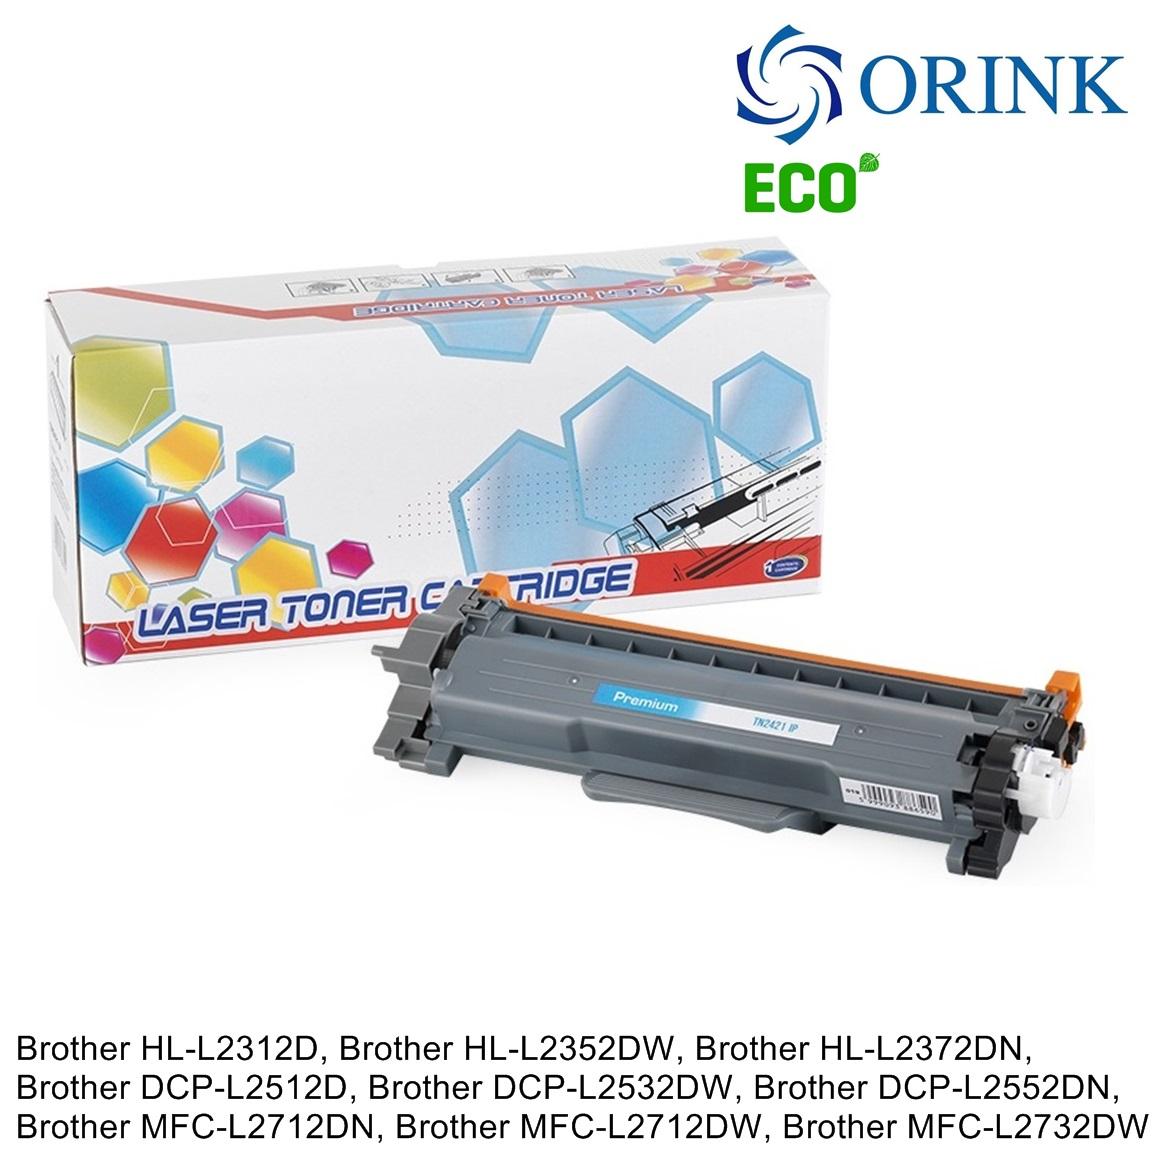 Brother TN-2421 (3K) ORINK ECO Касета